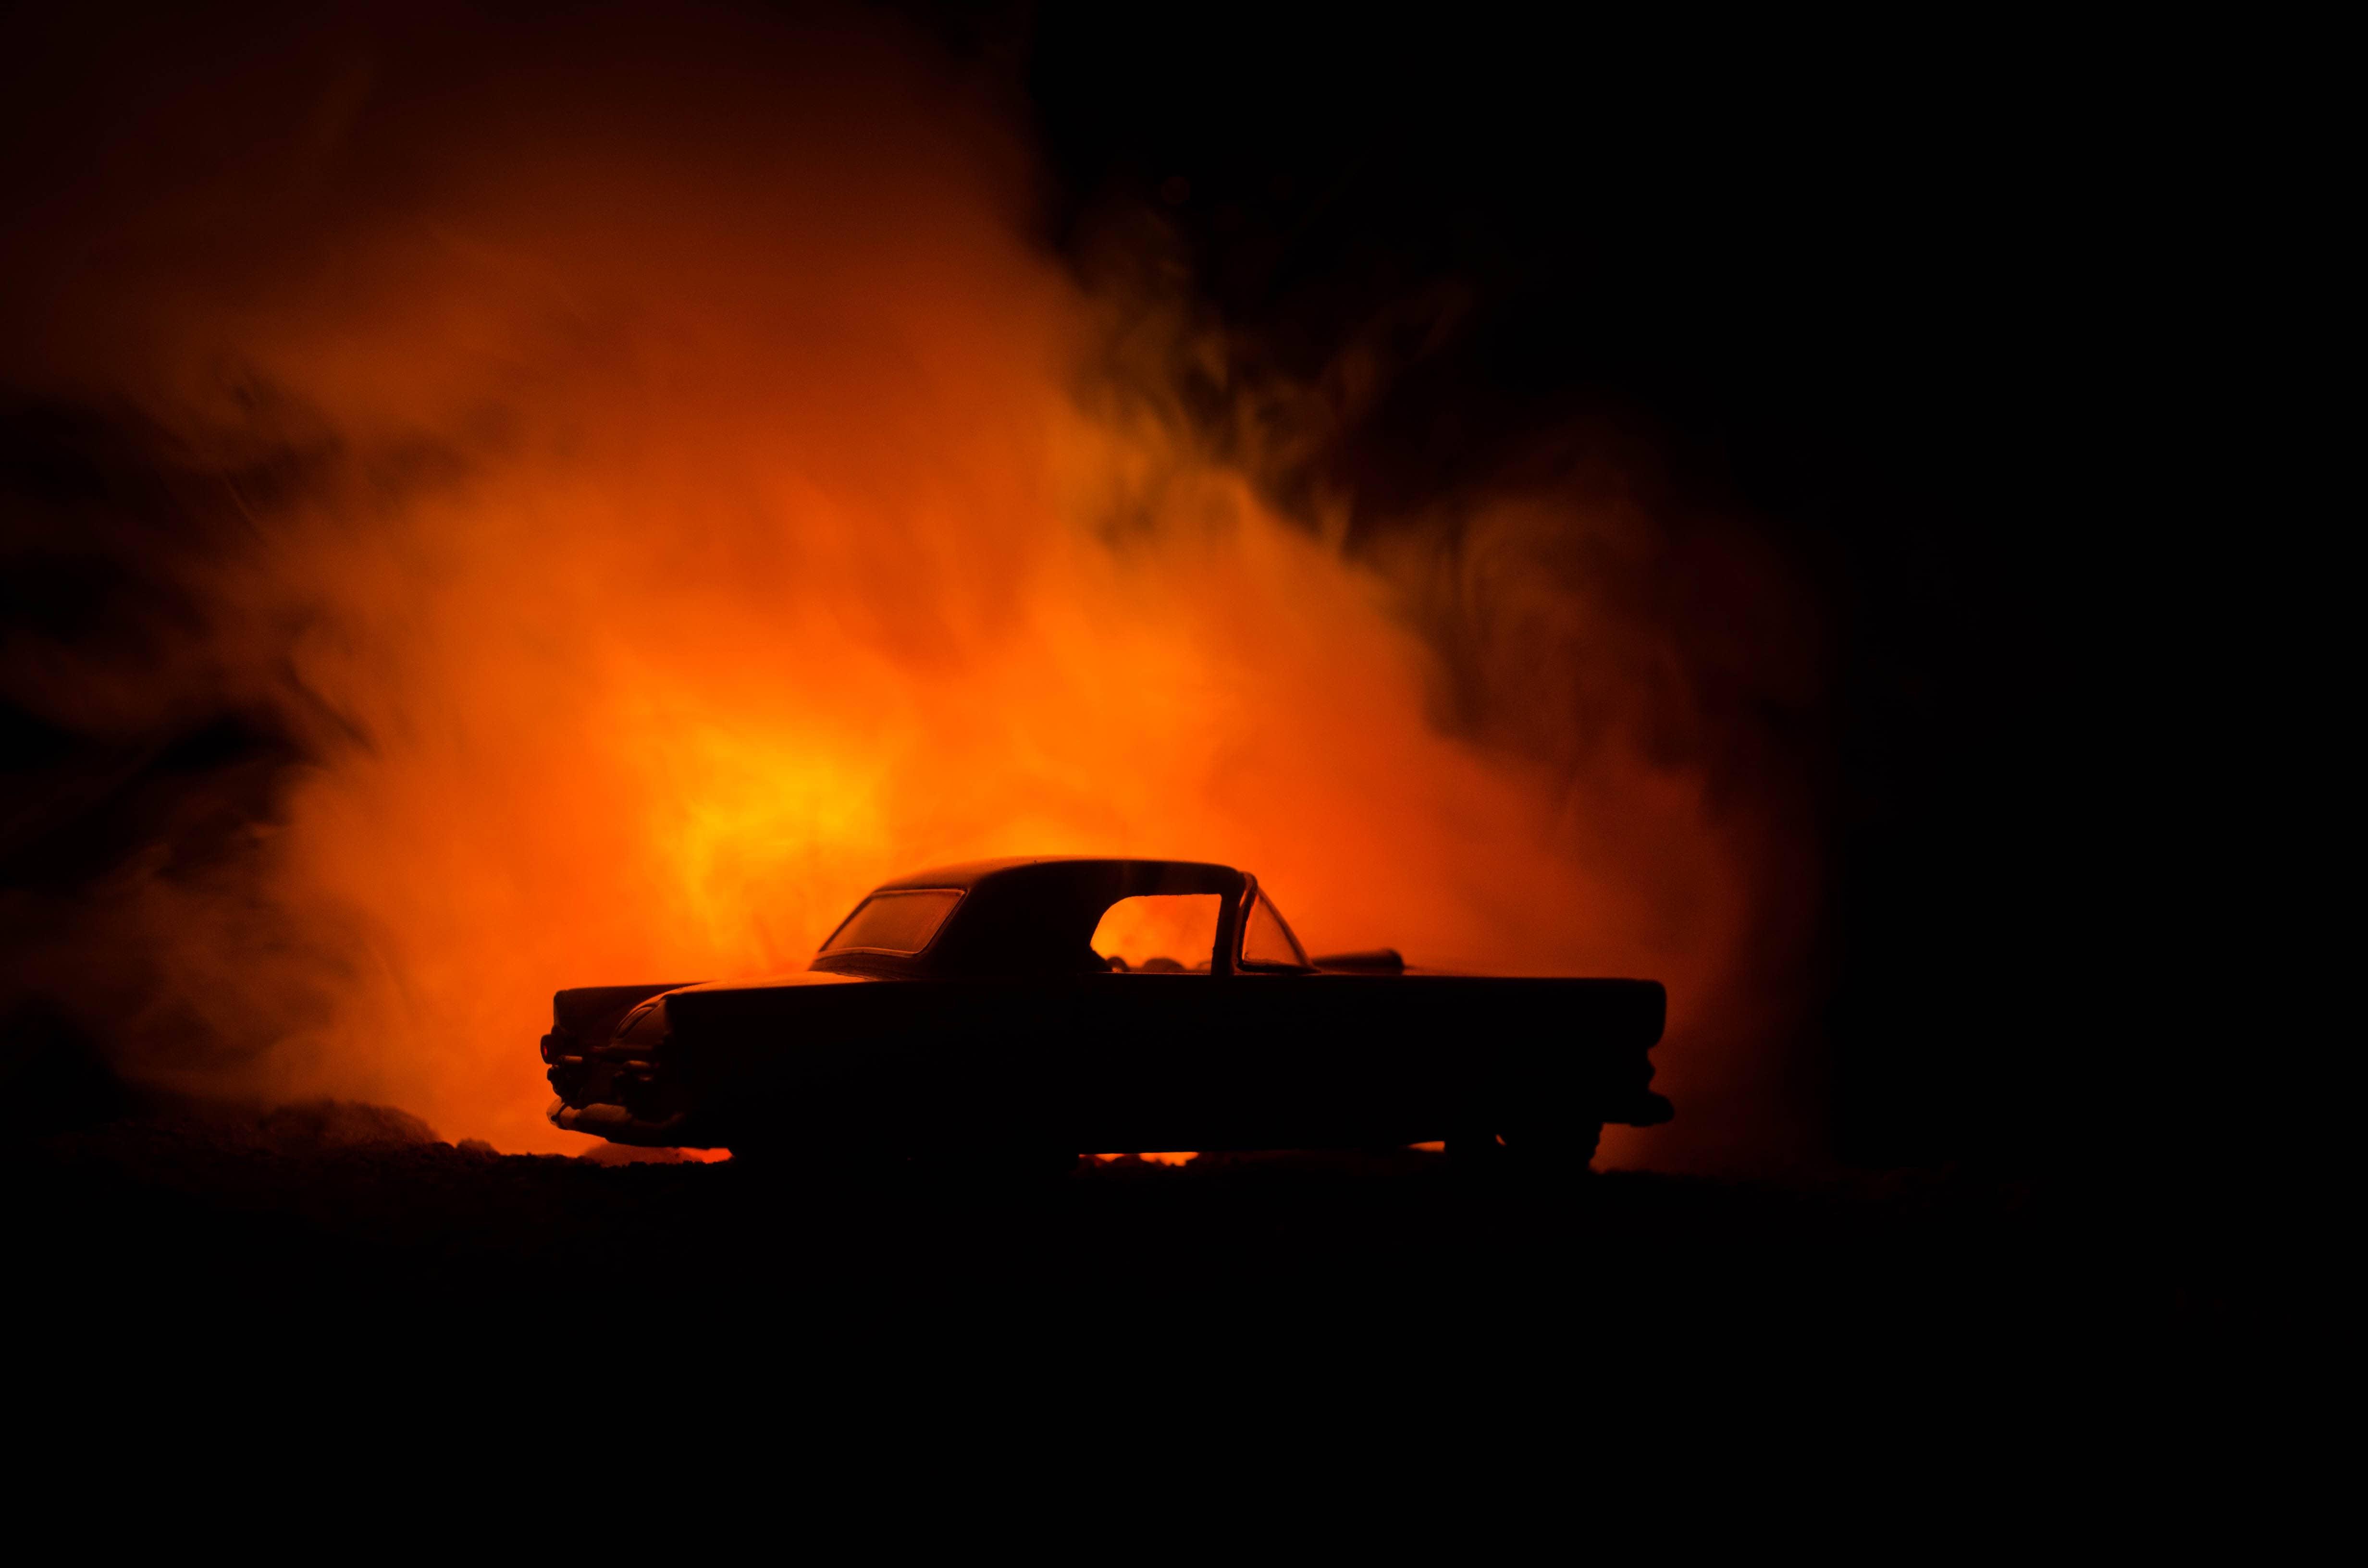 2 Drivers Killed in Fiery Head-On Crash on West Main Street [Patterson, CA]